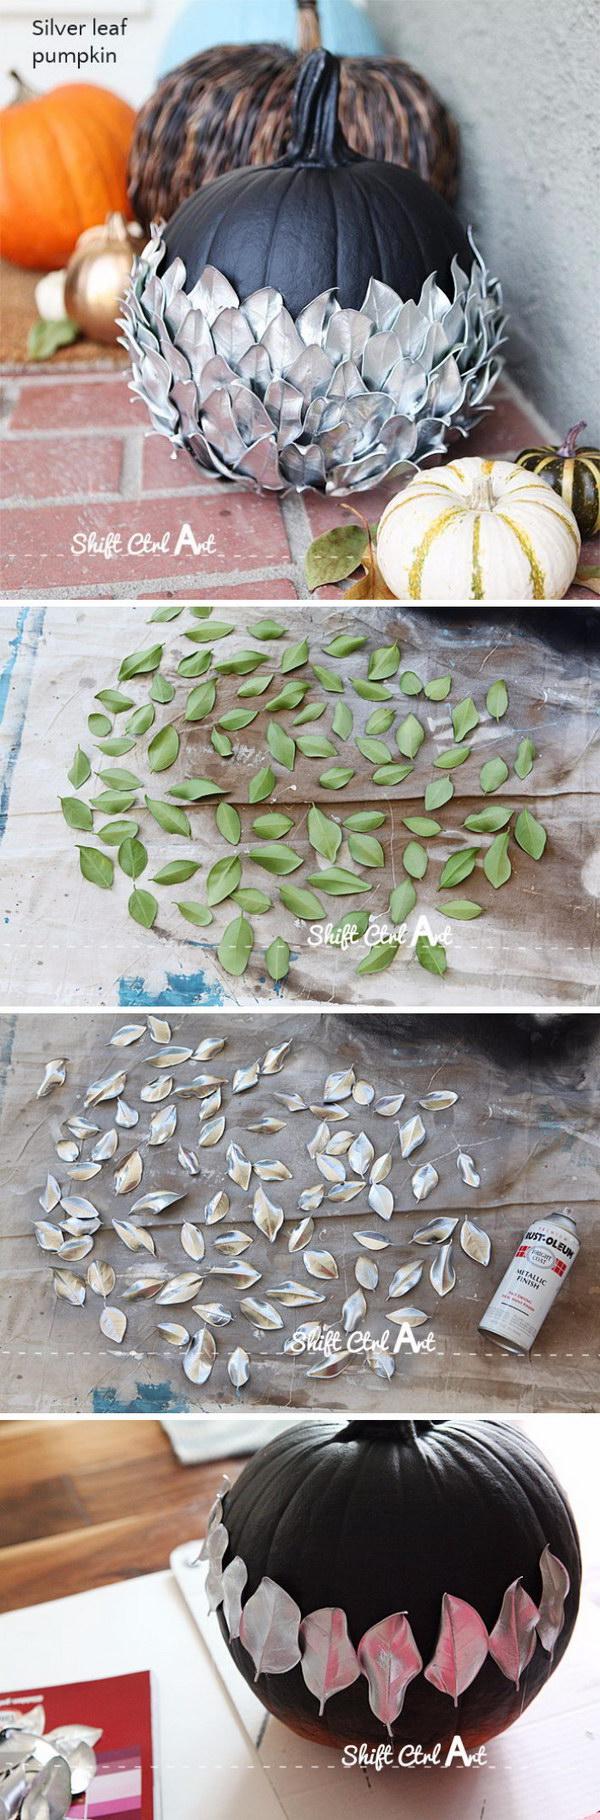 Silver Leaf Pumpkin.